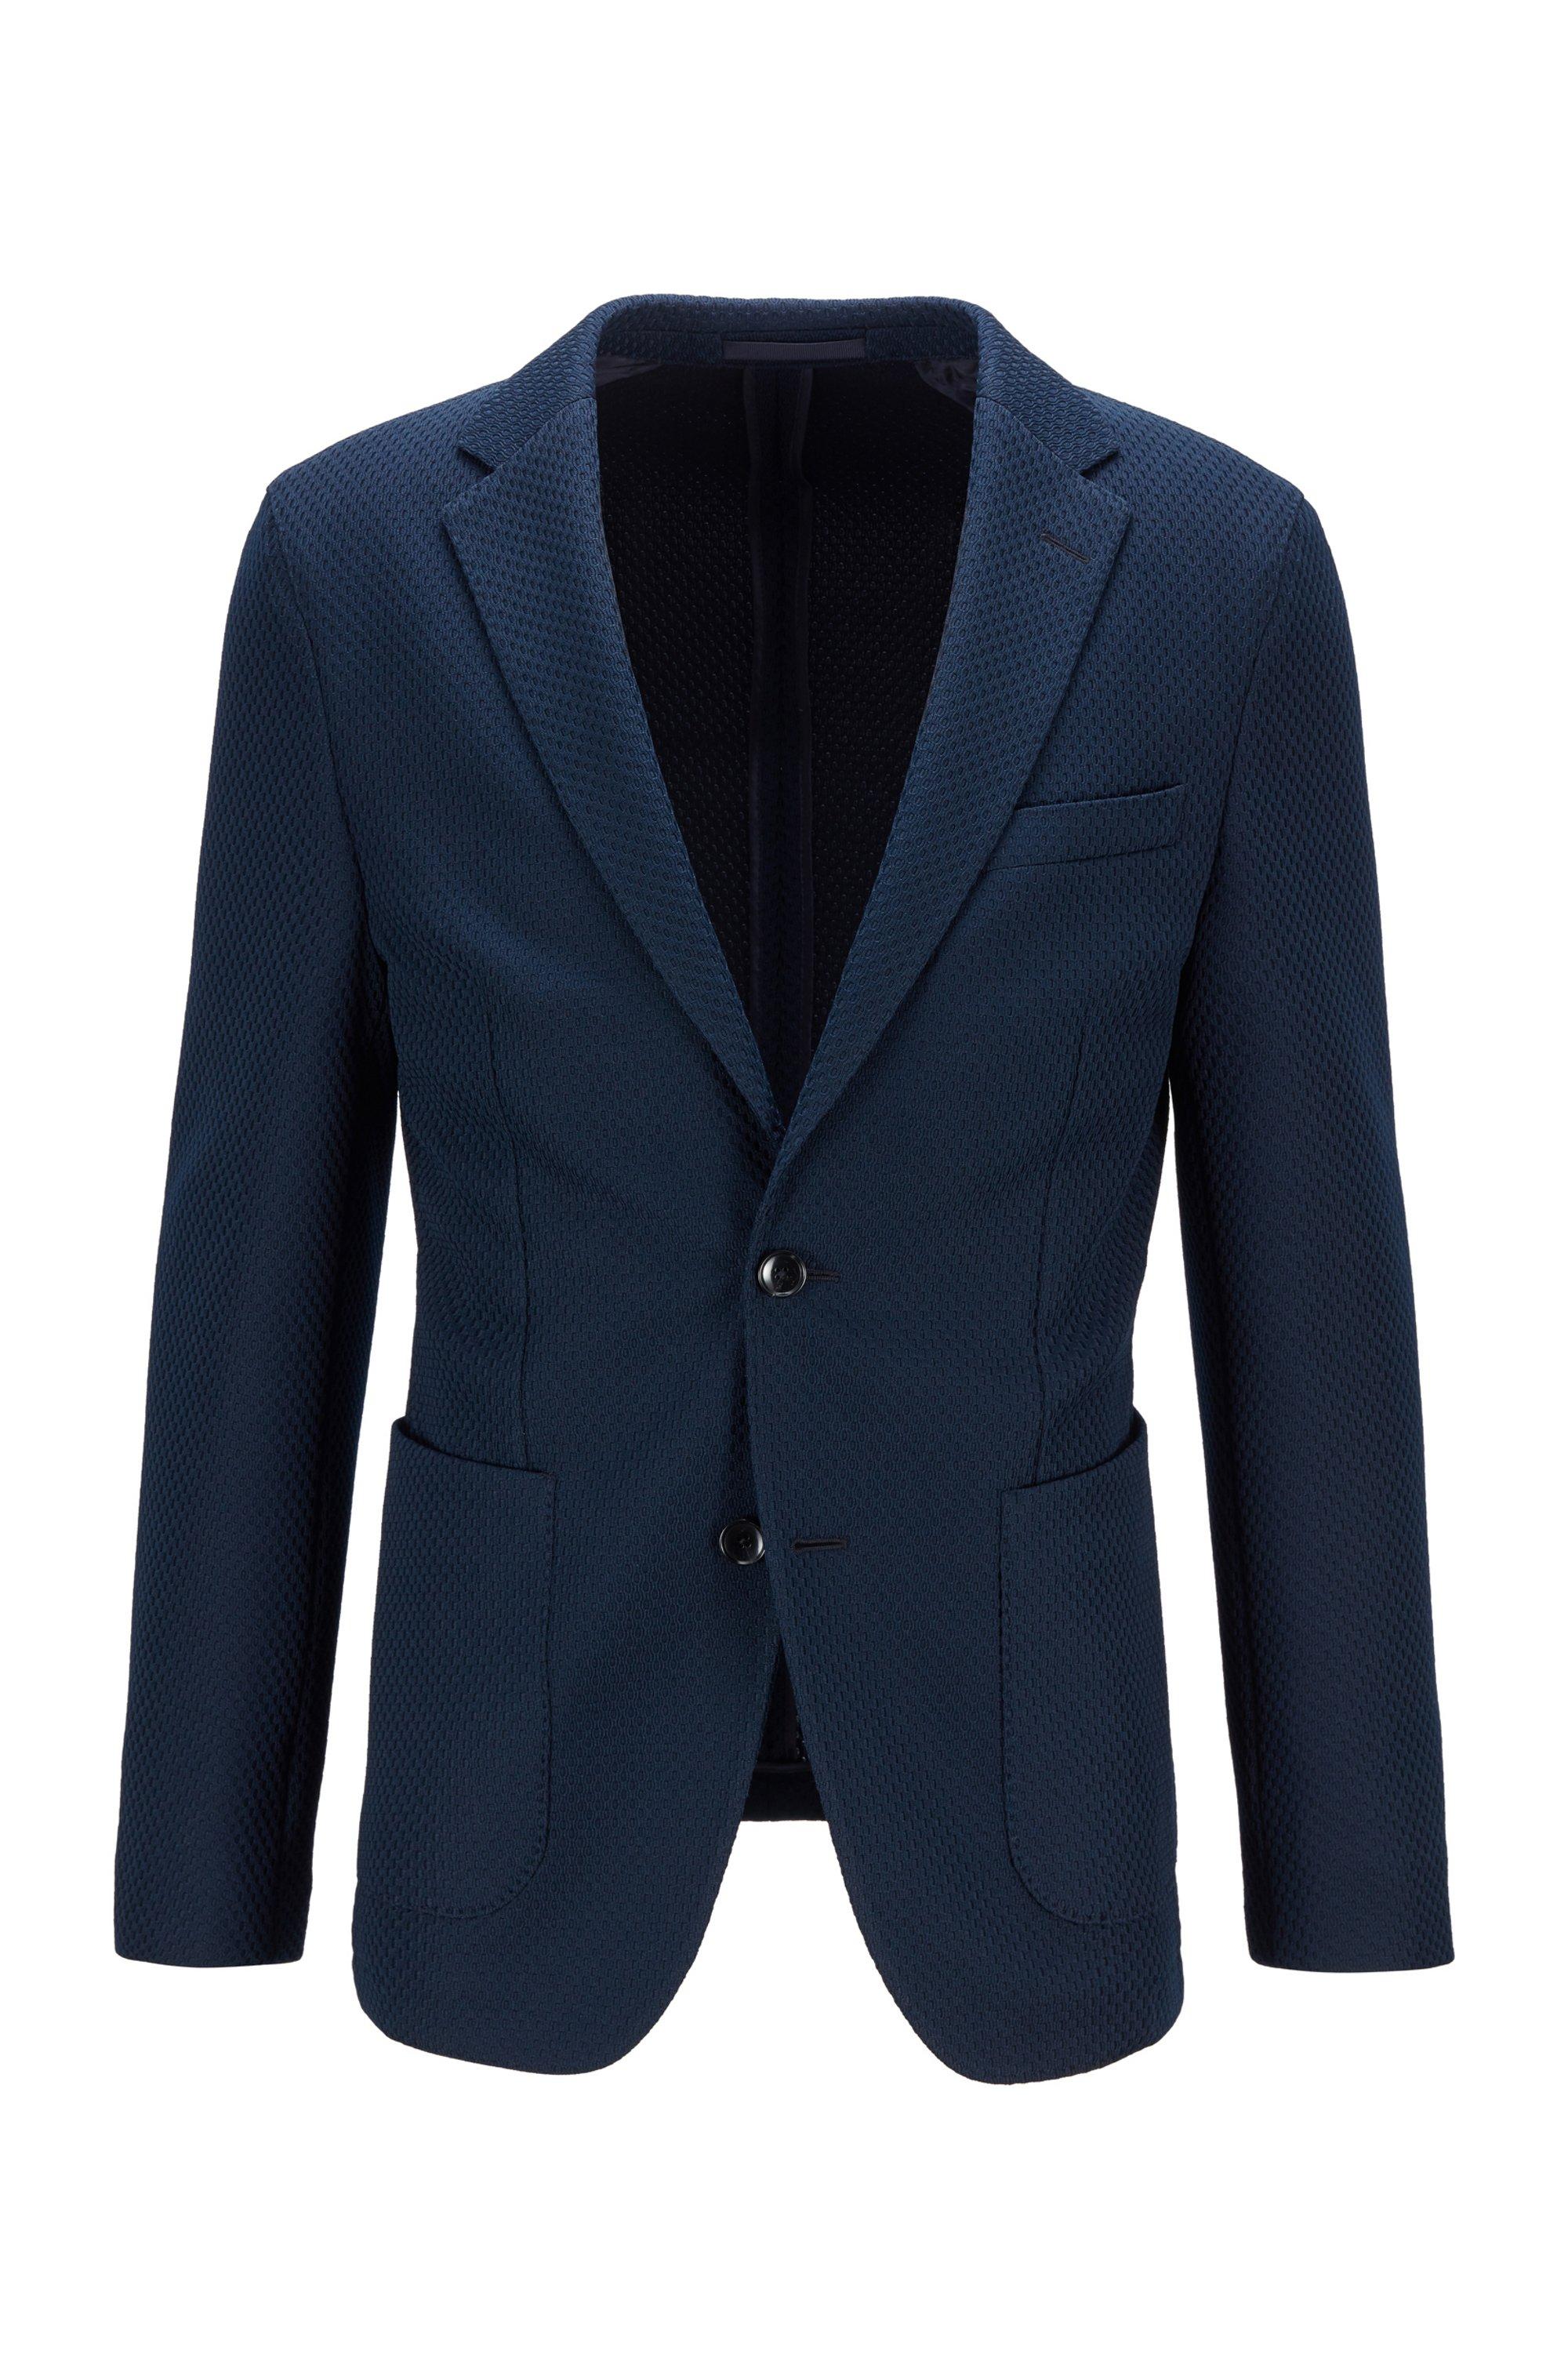 Slim-fit jacket in micro-patterned fabric, Dark Blue